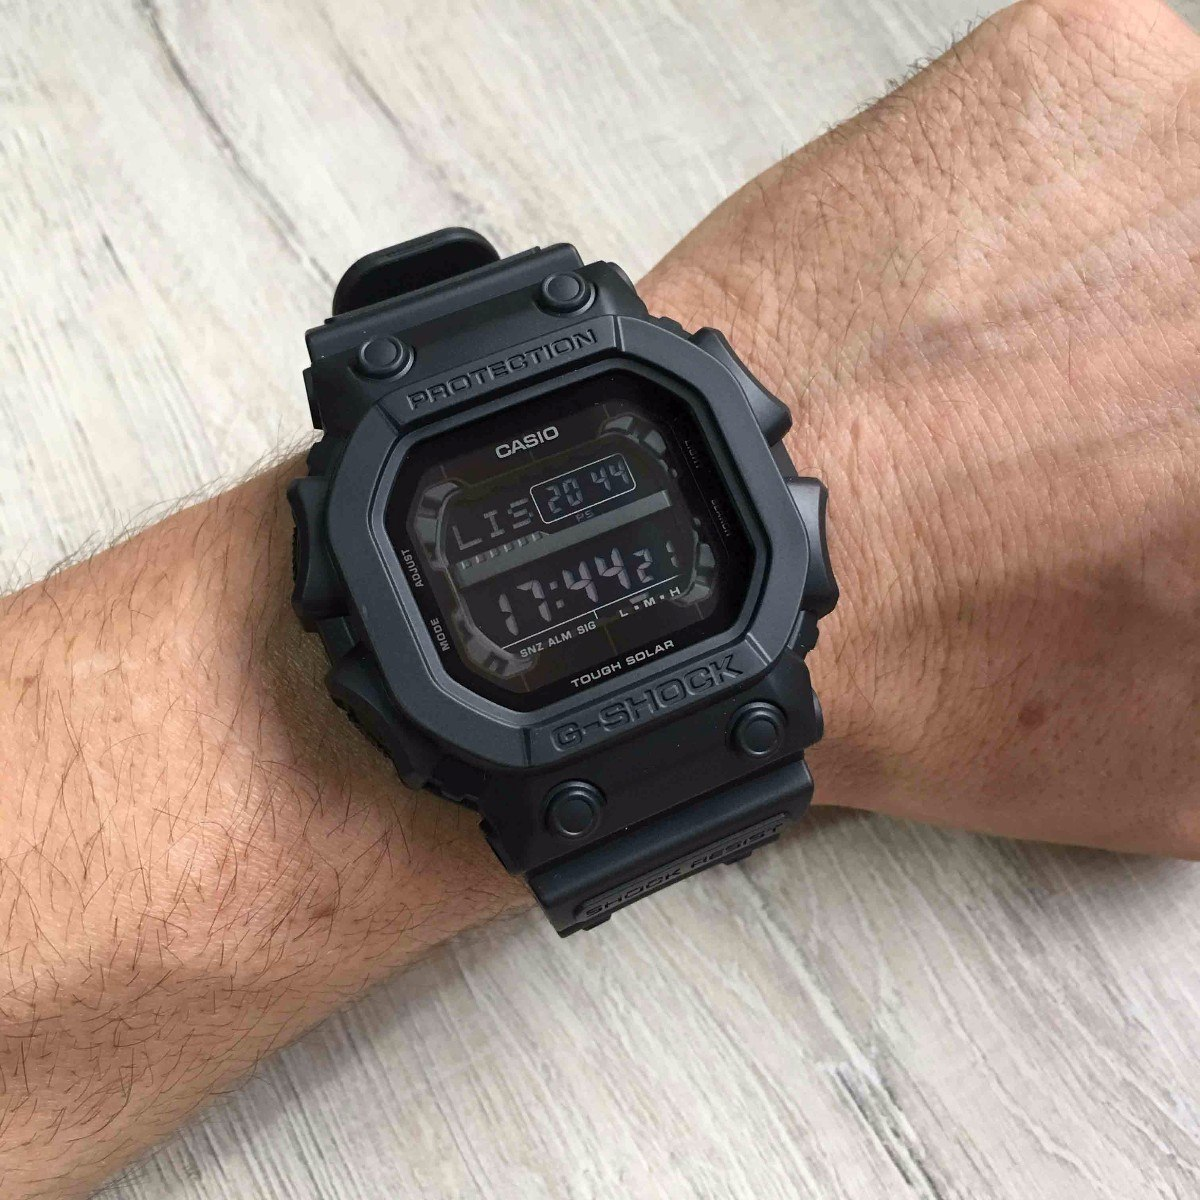 df18643490dc relógio casio digital g shock gx56bb gx56 militar nf. Carregando zoom.